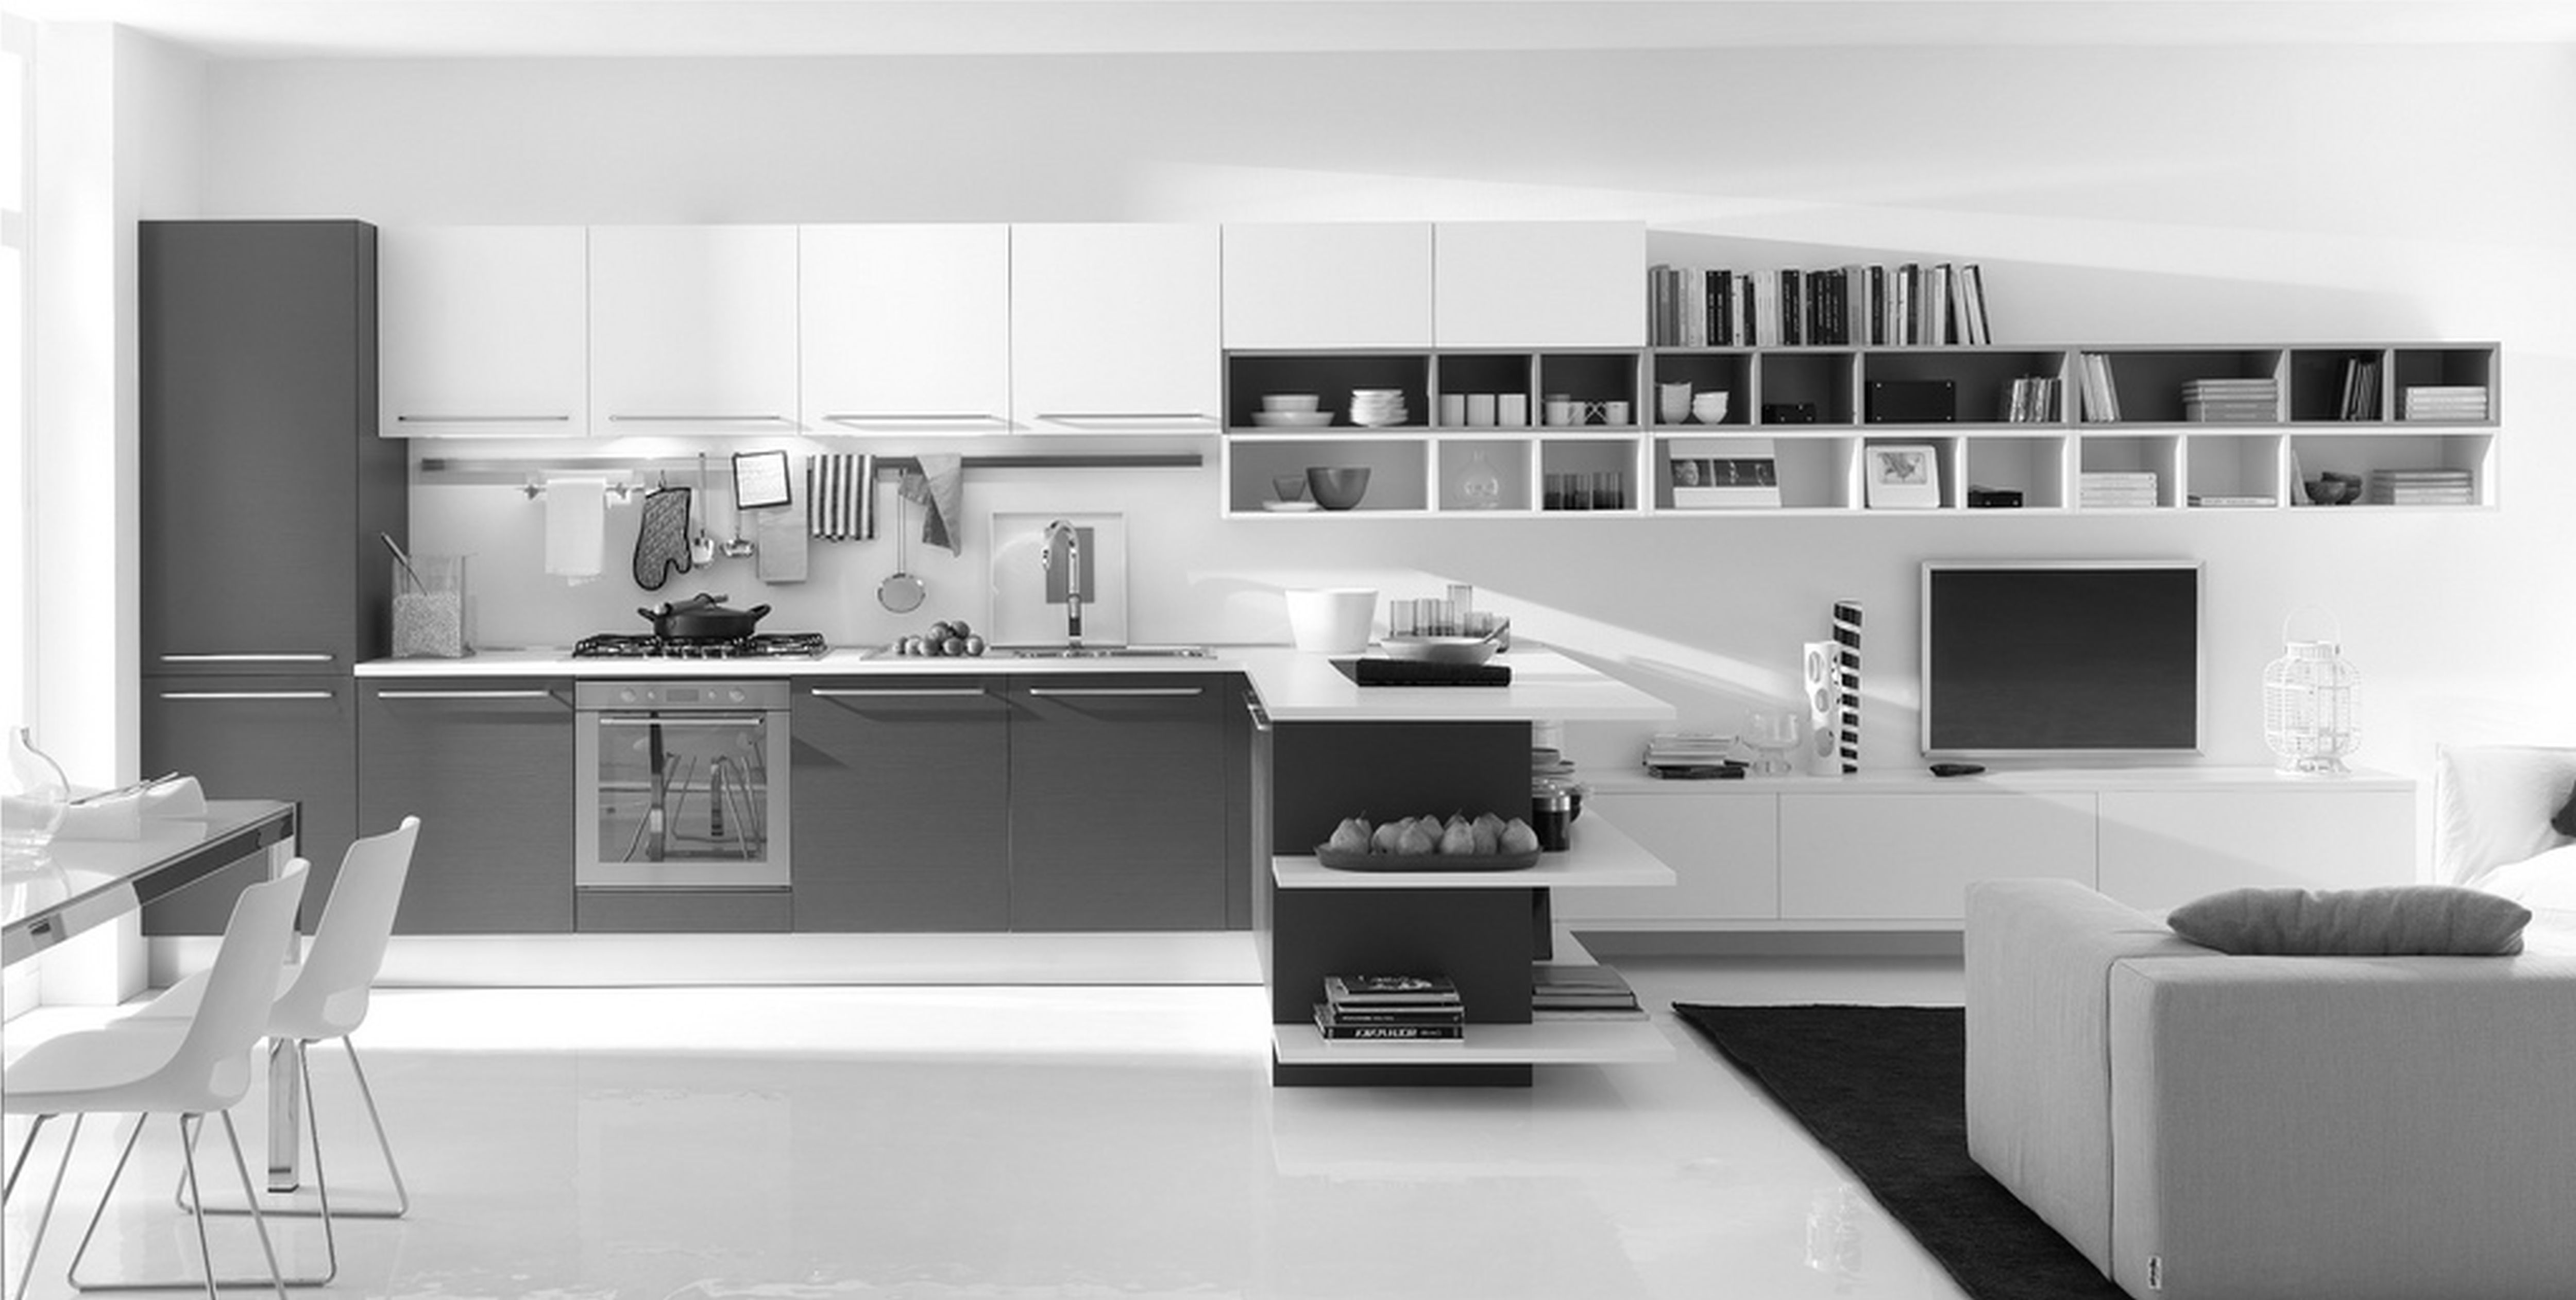 download-modern-kitchen-wallpaper-high-definition-e84vo-sensational-design-ideas-modern-white-kitchen-wallpaper